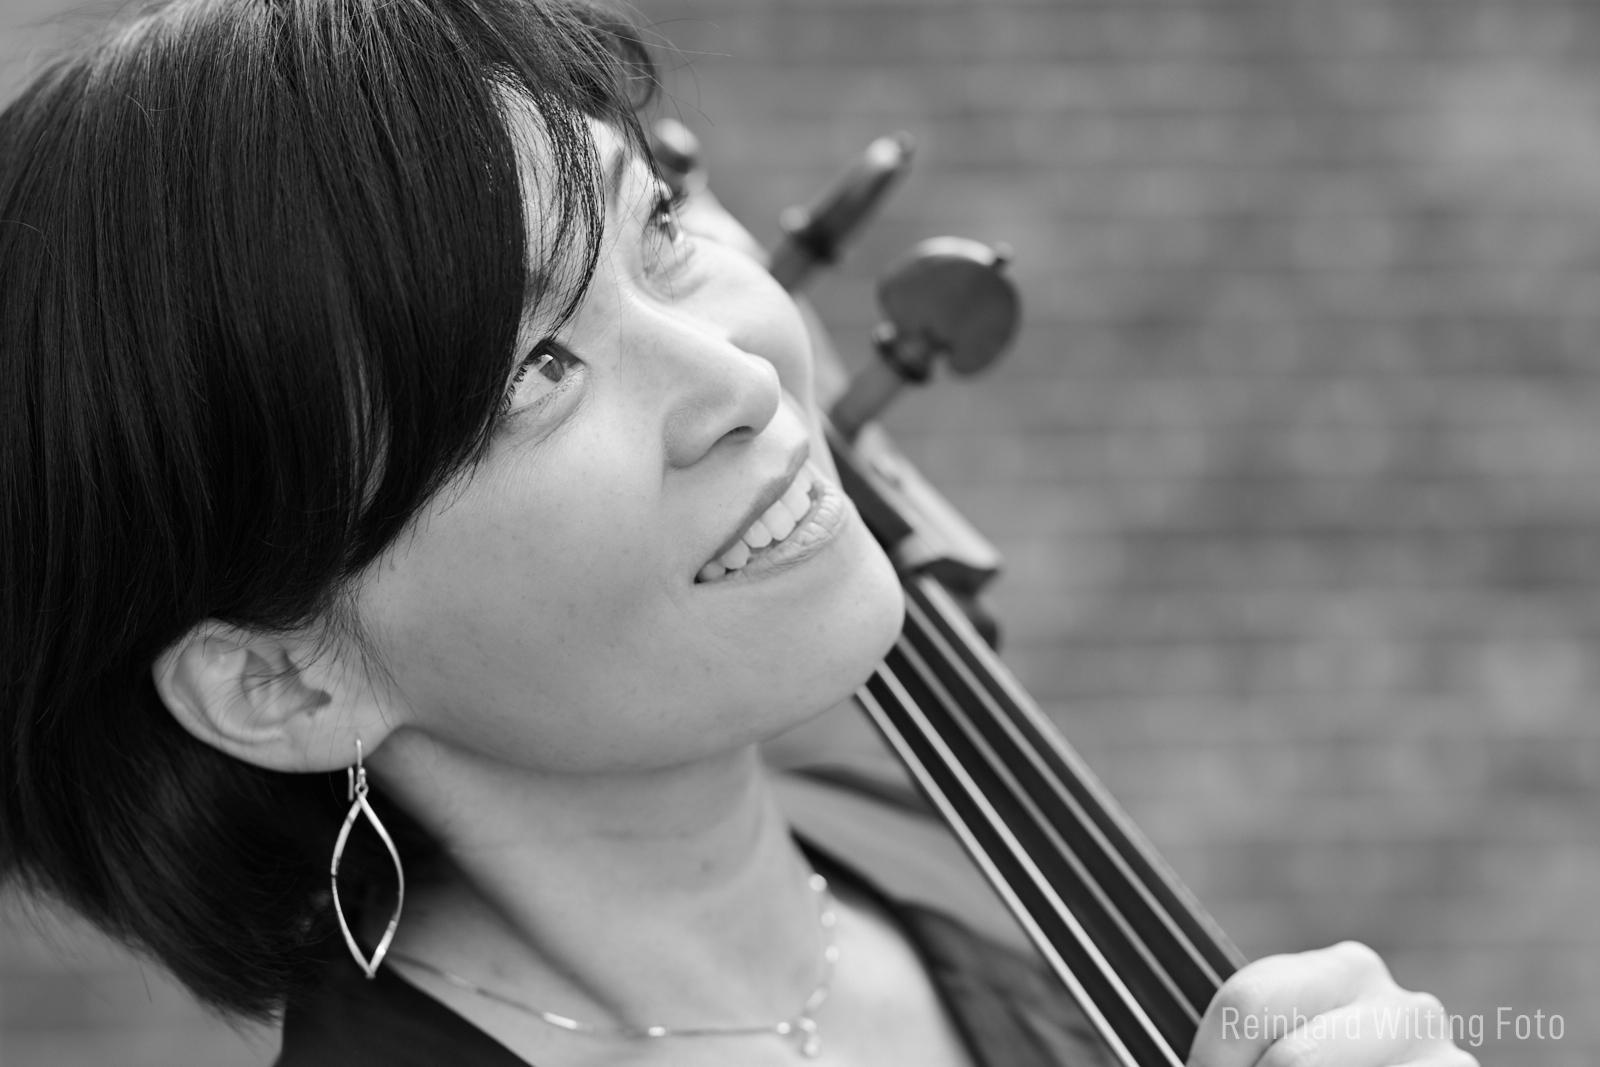 Mime Brinkmann, cello